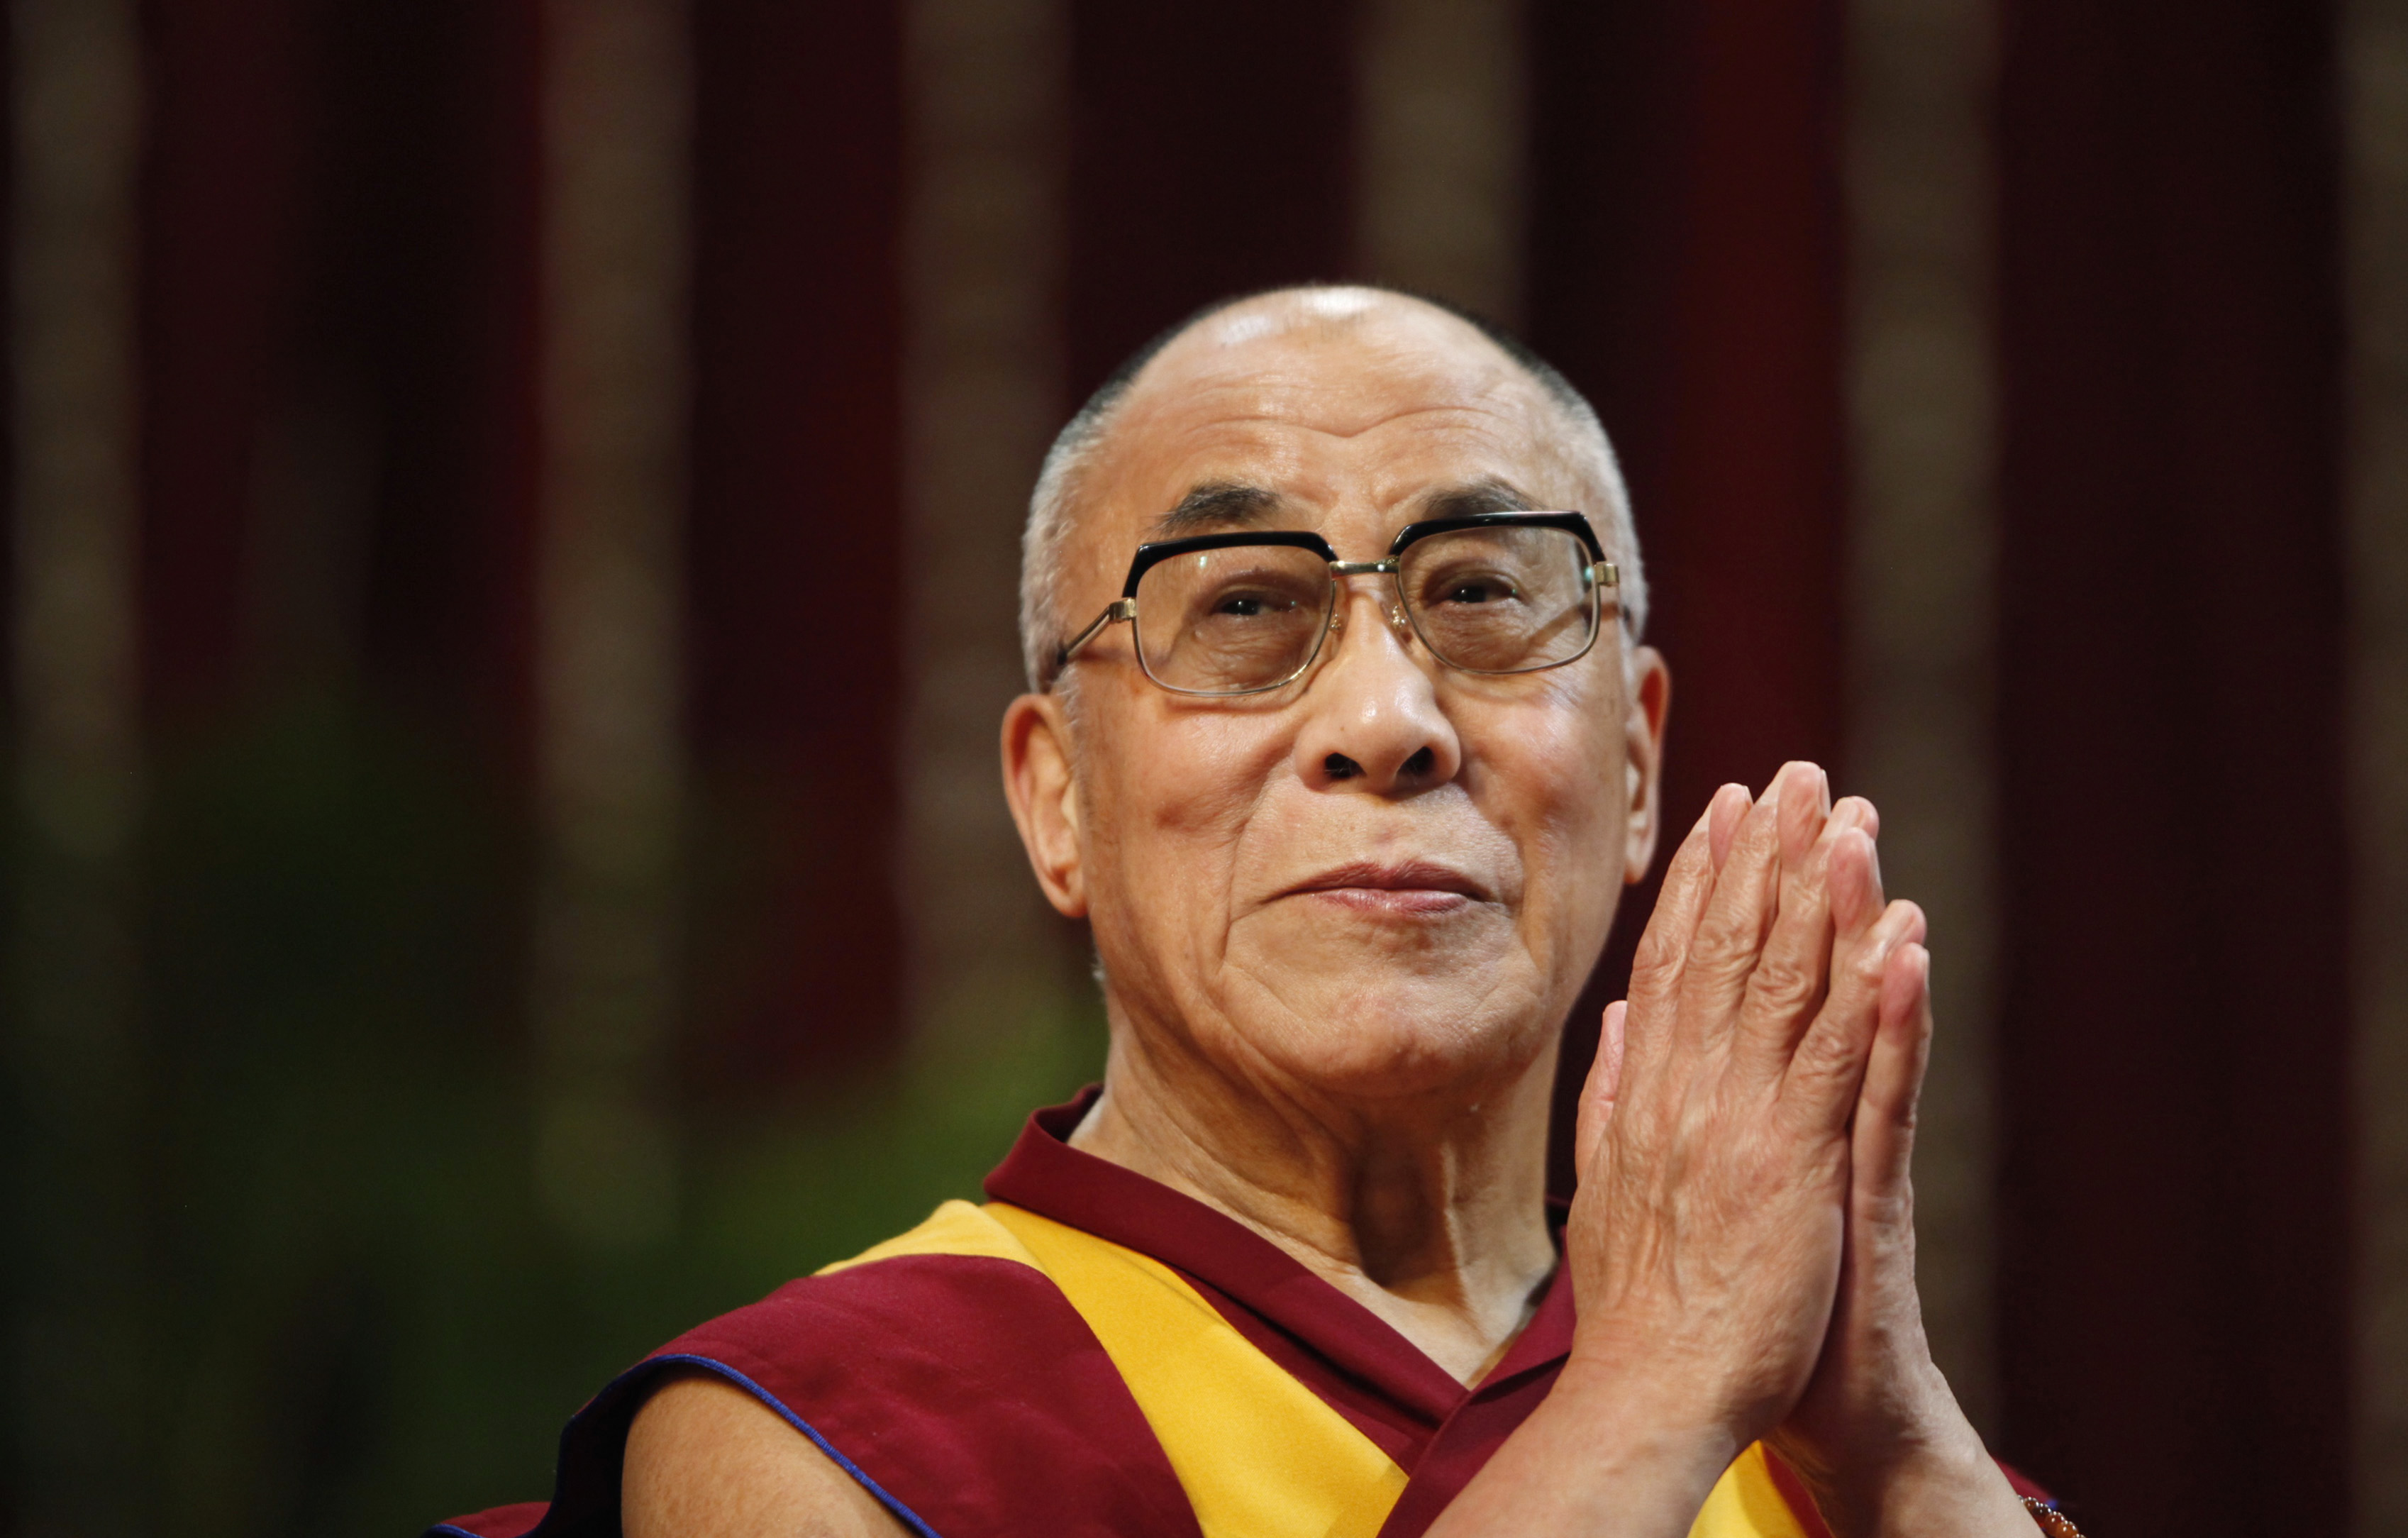 The Dalai Lama speaks